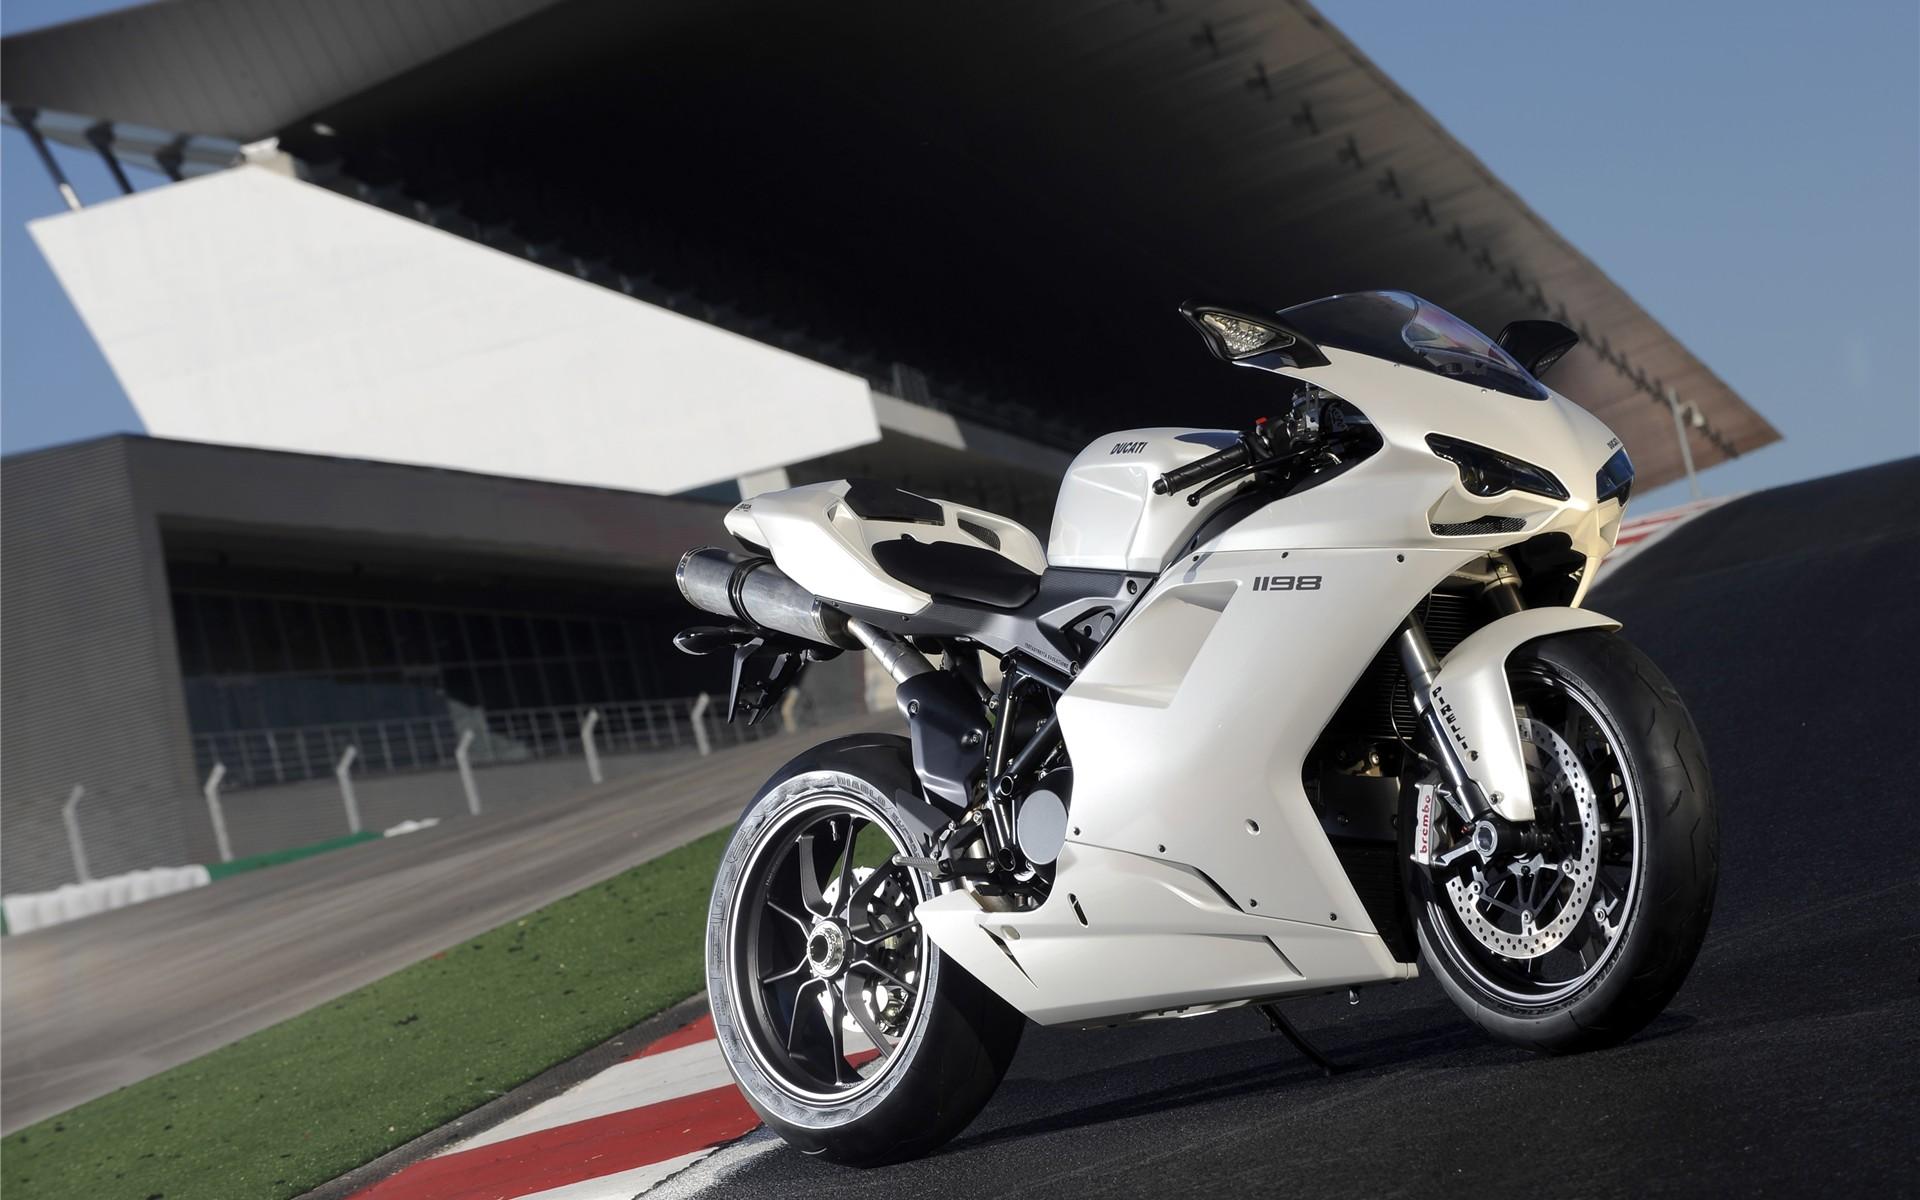 49 Ducati Wallpaper Hd On Wallpapersafari